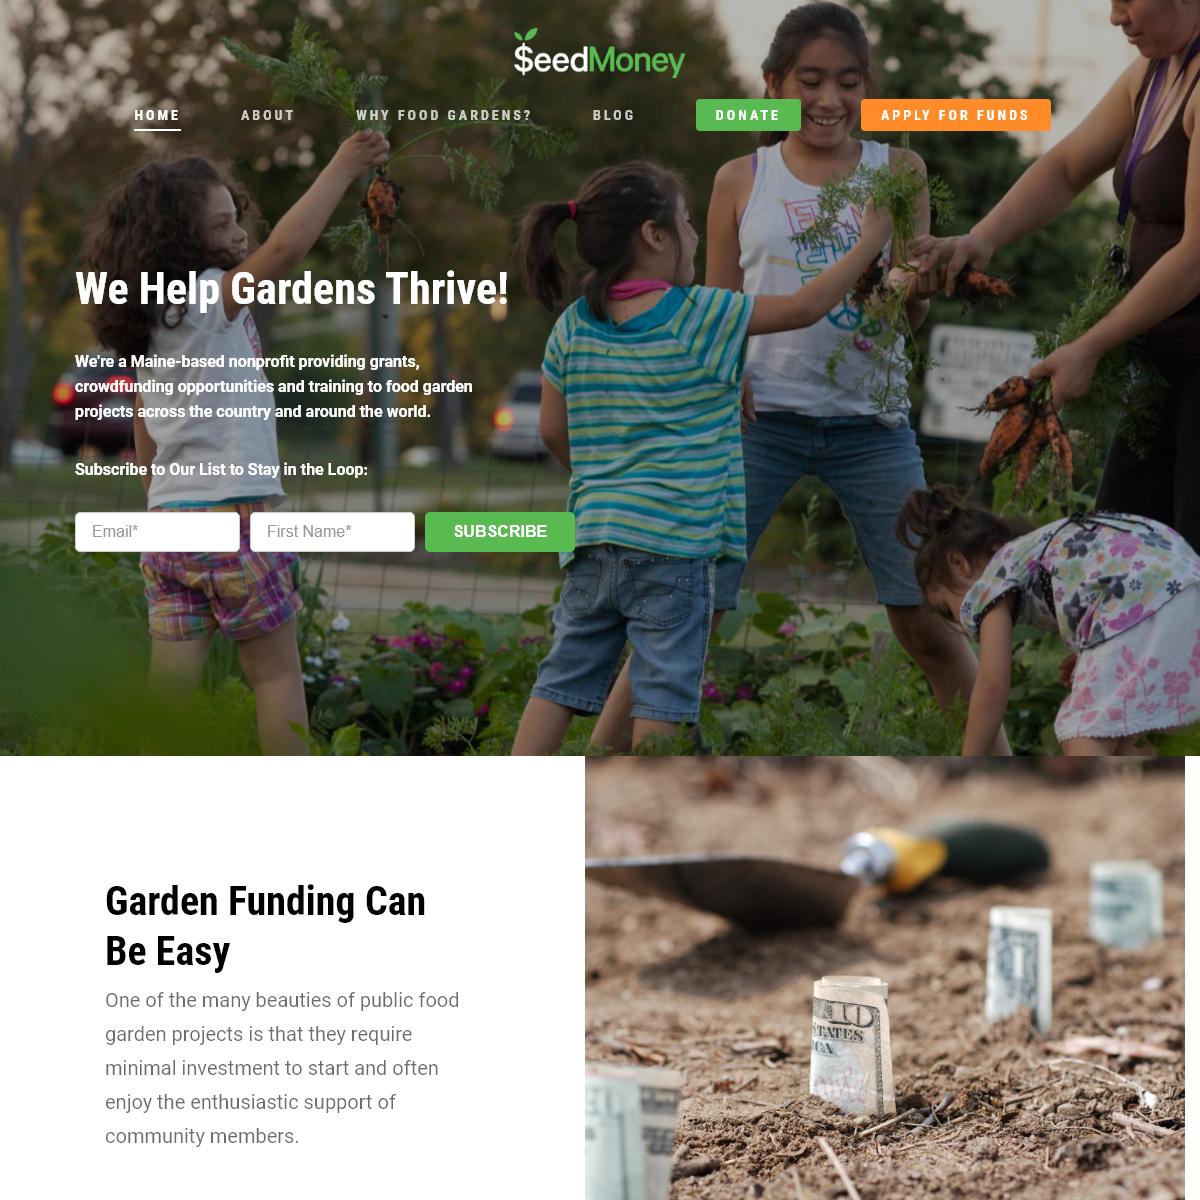 Garden Grants and Crowdfunding- SeedMoney Can Help You Grow!